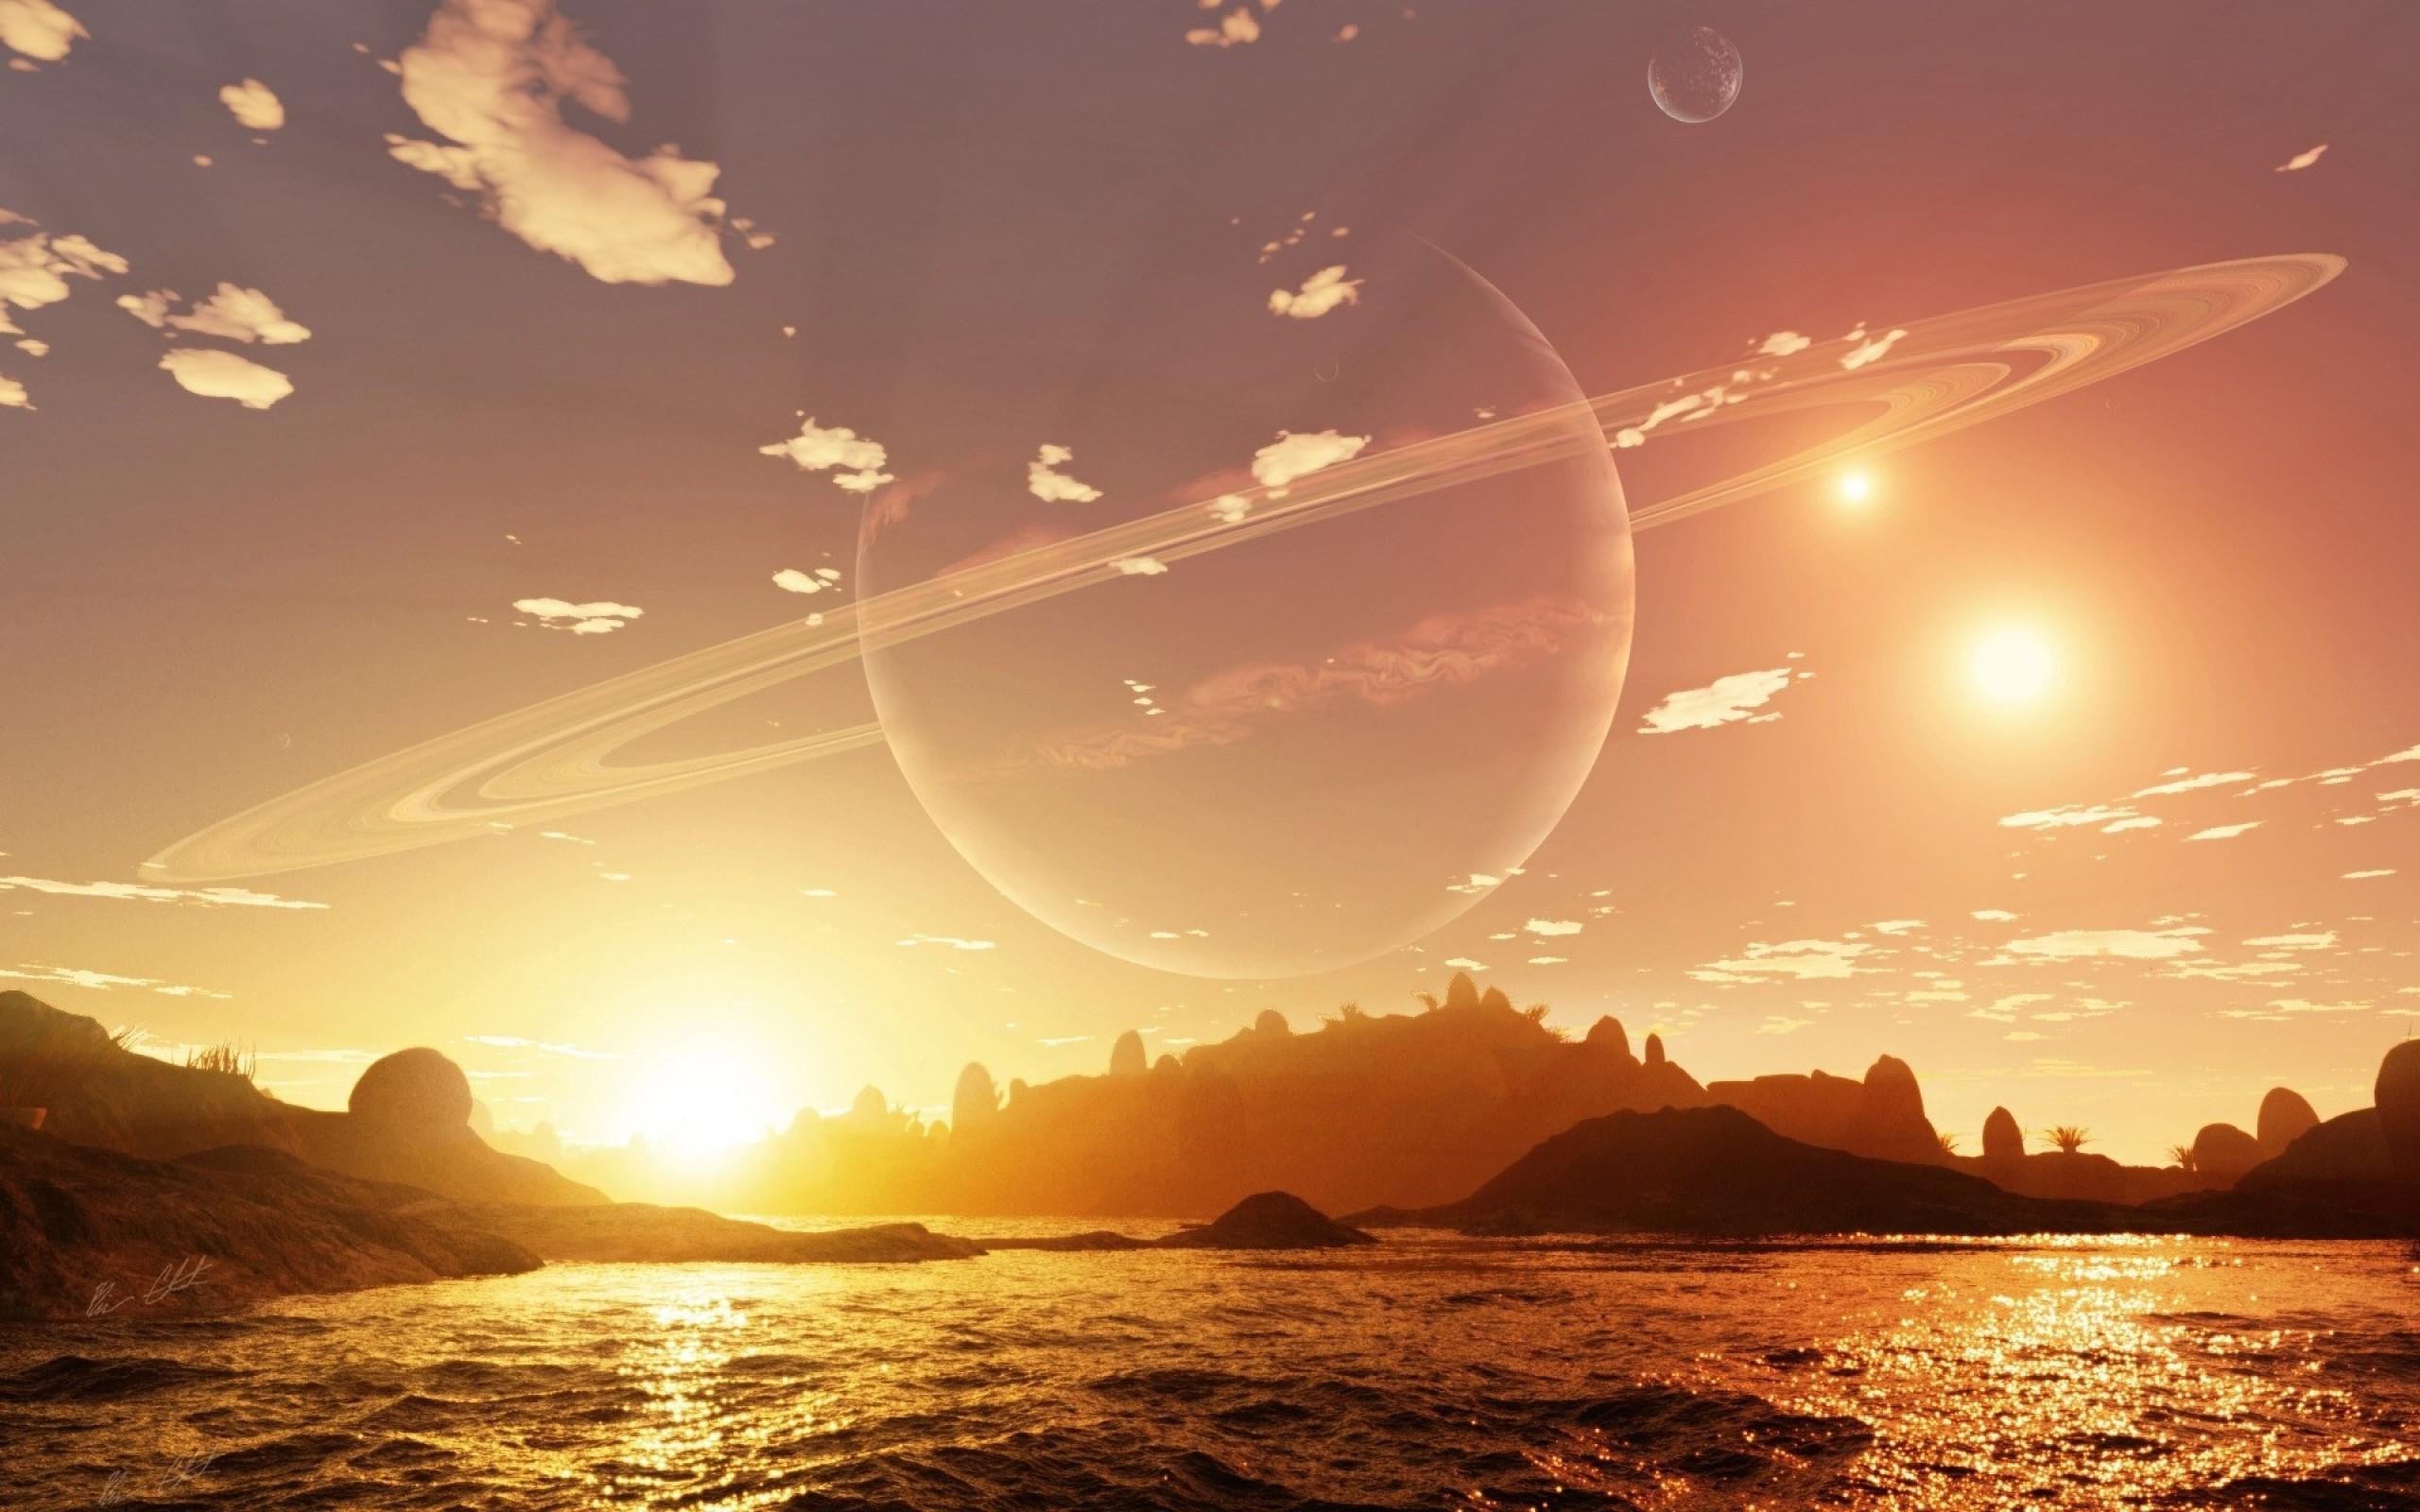 Download Sci Fi Landscape #9zj0r » aHuHaH.com